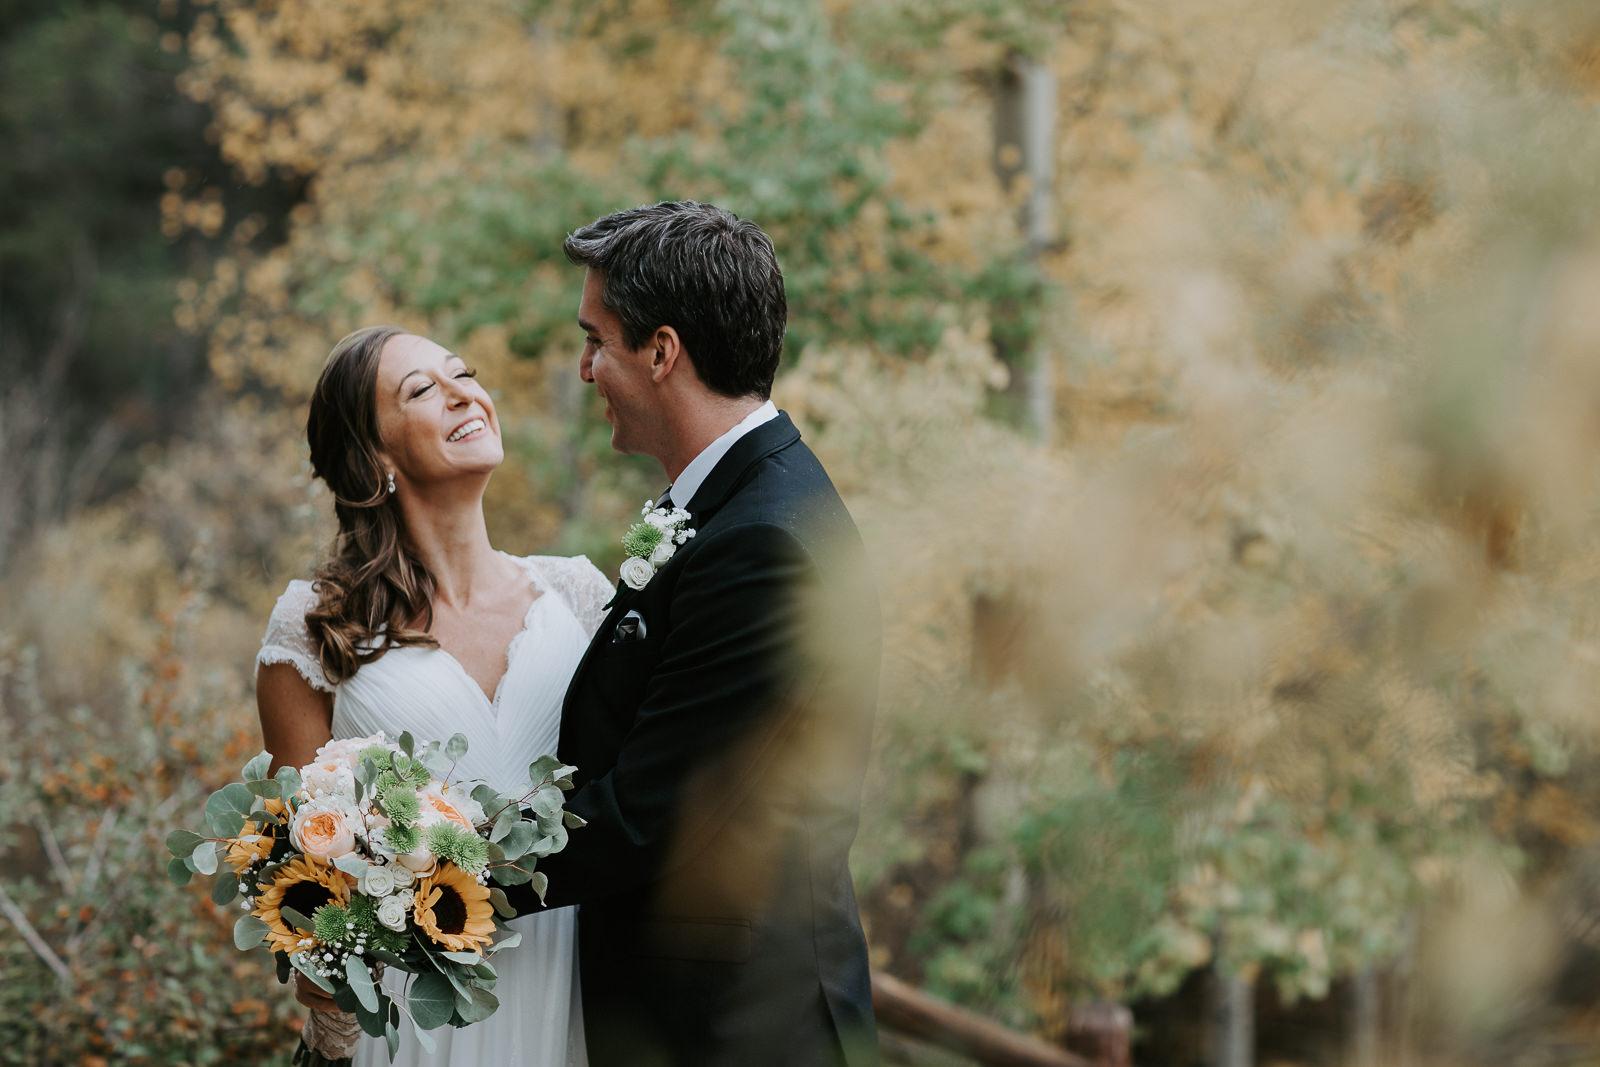 Quaking Aspen Amphitheater wedding fall colors Keystone Colorado leaves